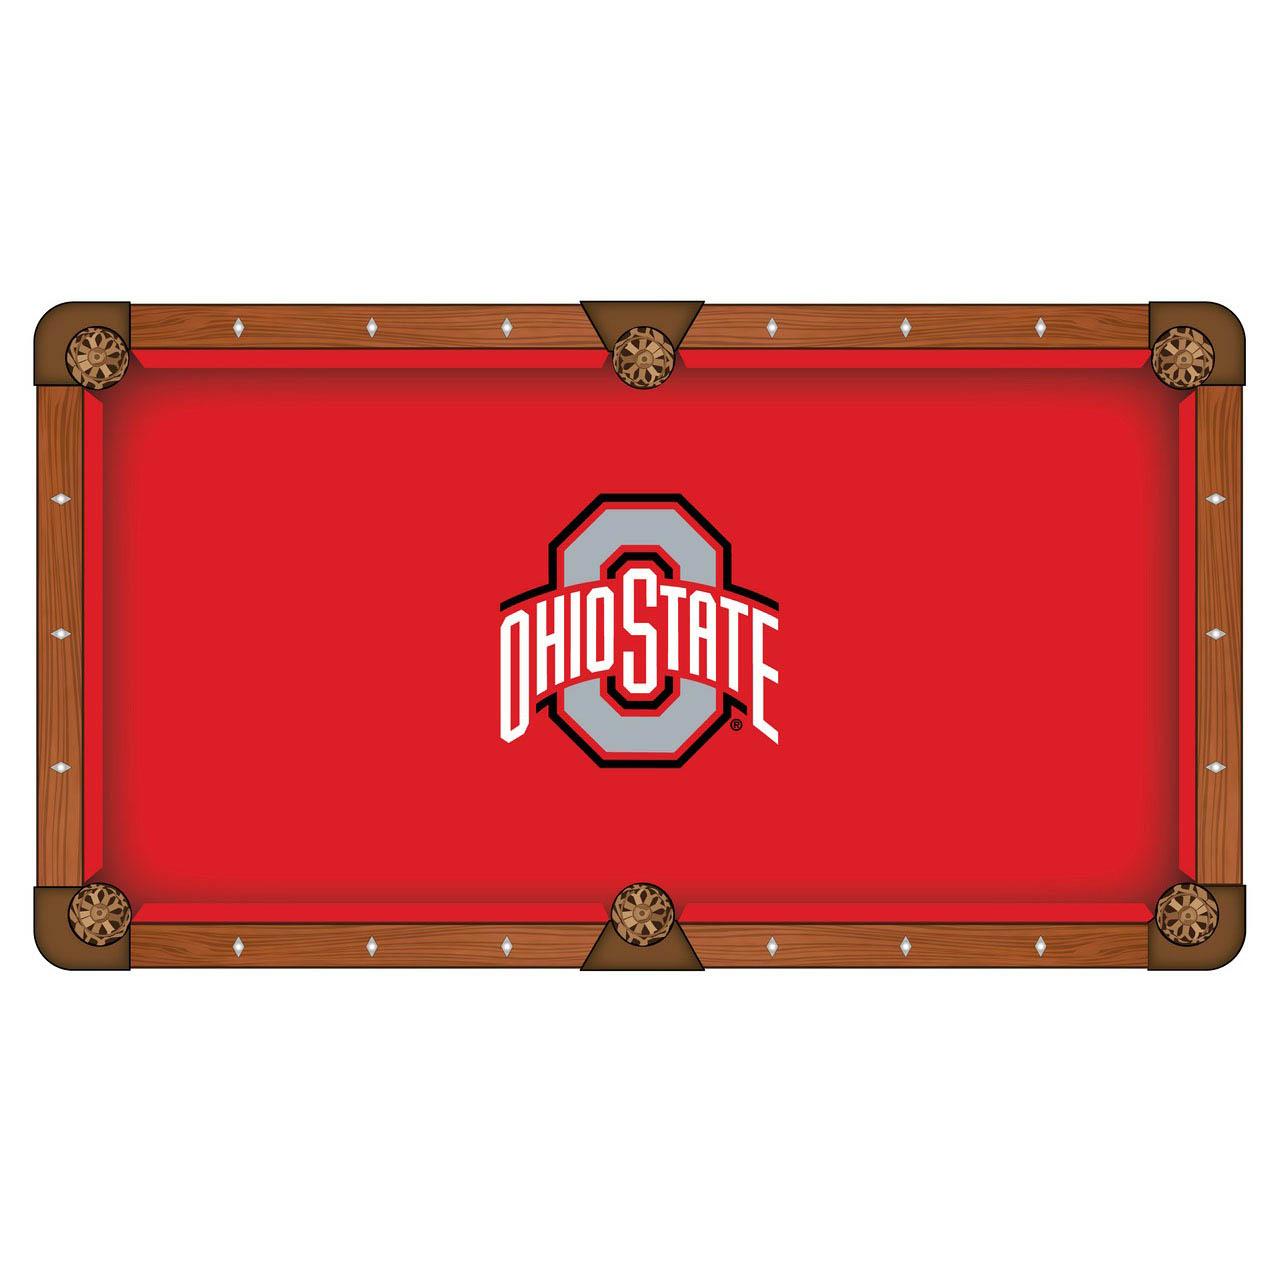 University | Cloth | State | Table | Pool | Ohio